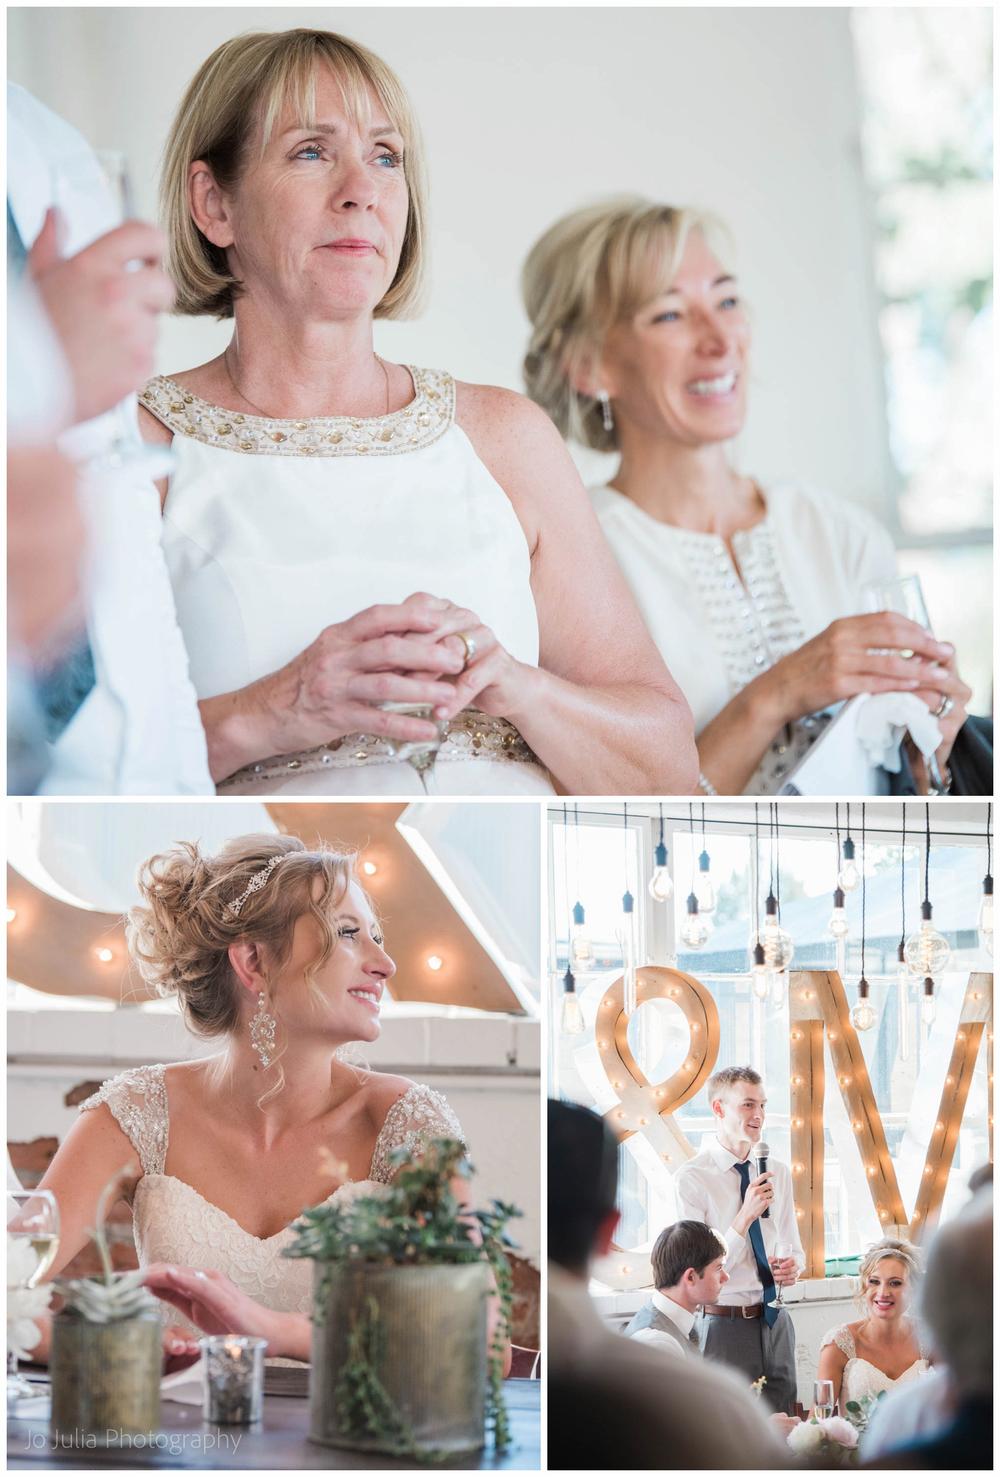 blanc-denver-wedding-photos_0097.jpg